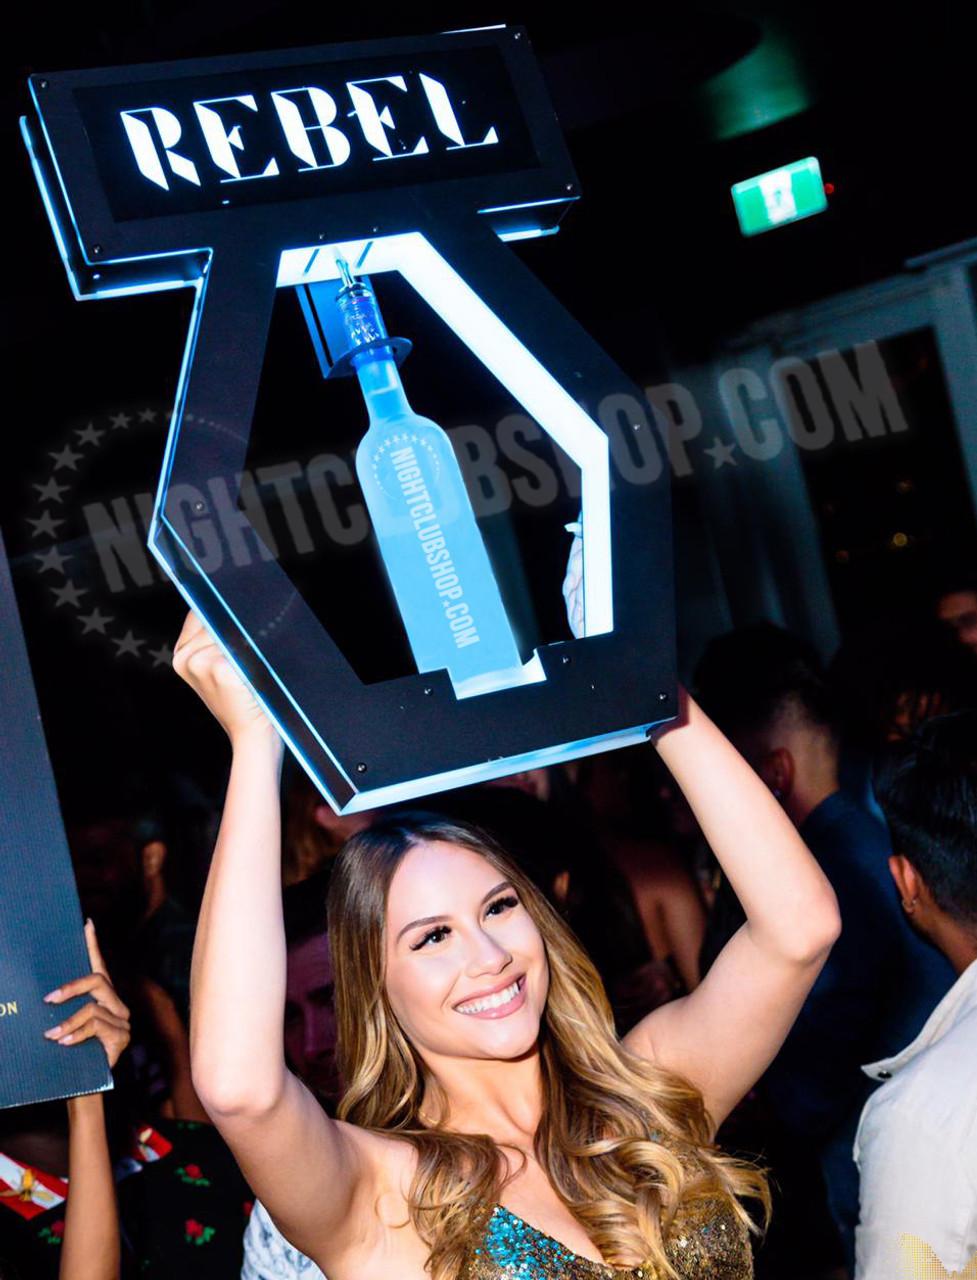 interchangeable, bottle, service, tray, presenter, VIP